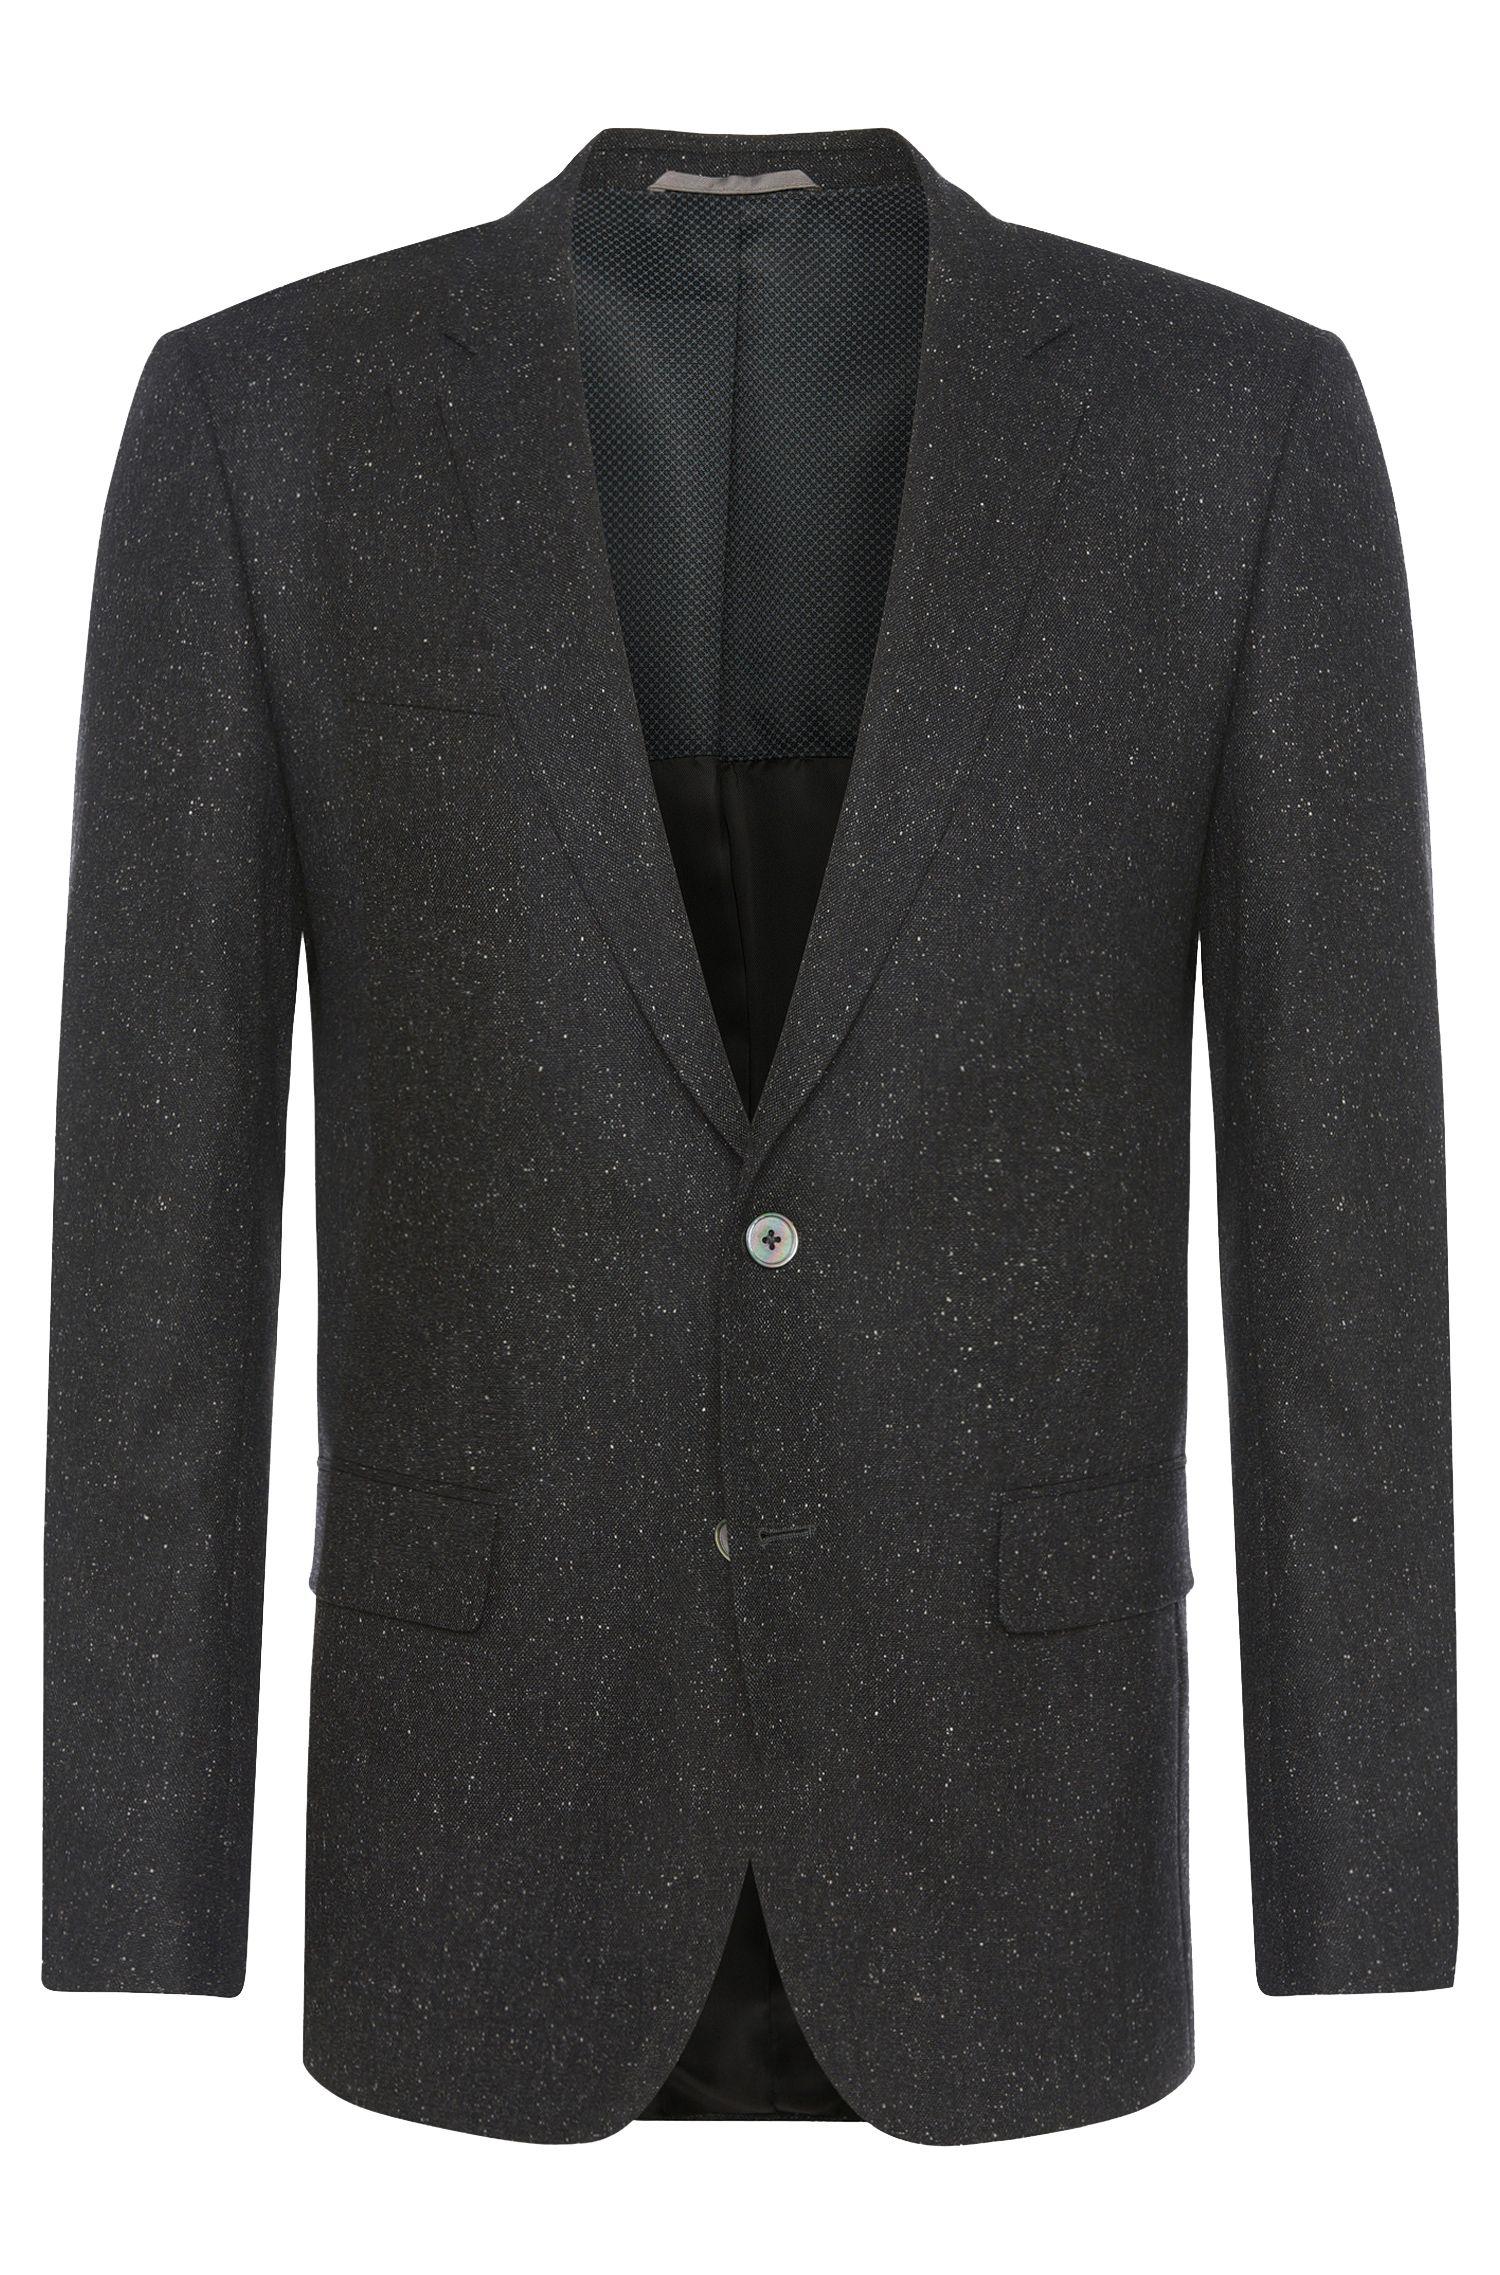 'Hutsons' | Slim Fit, Stretch Virgin Wool Silk Blend Sport Coat